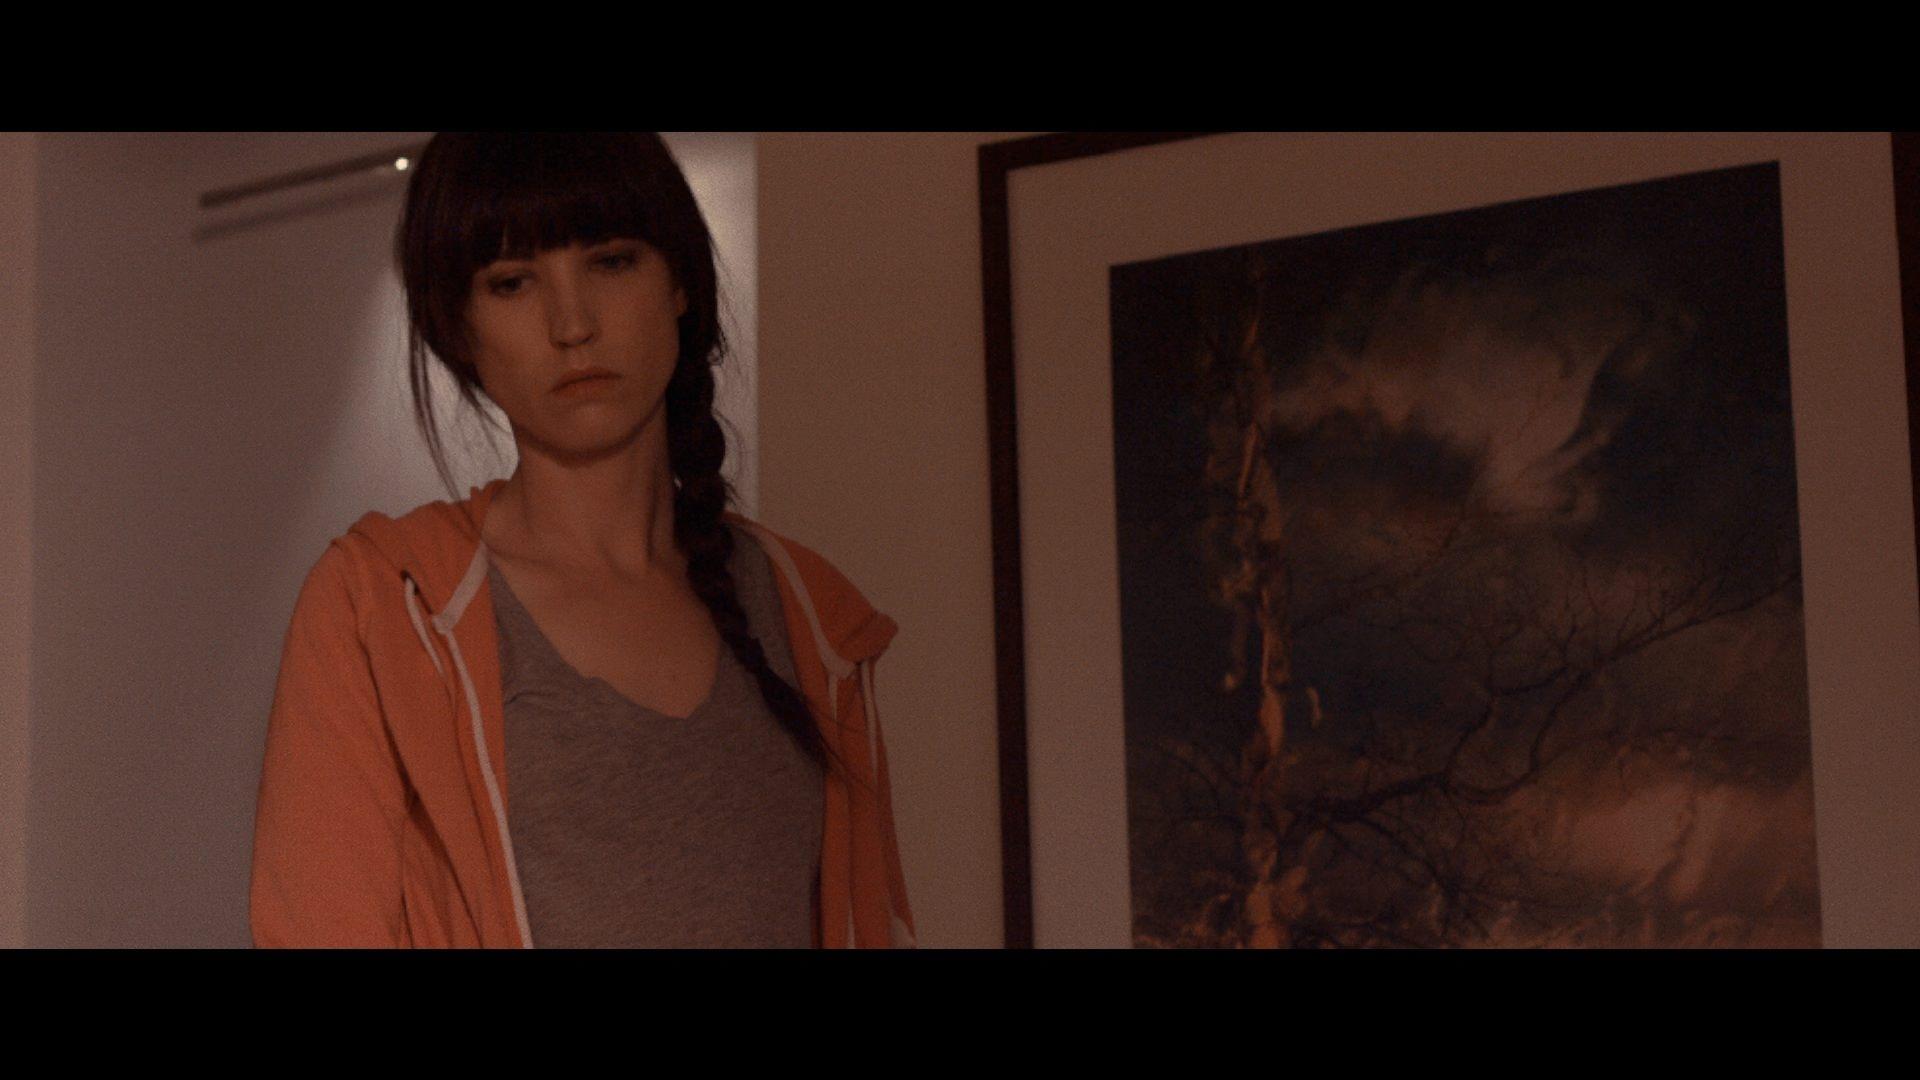 Kojii Helnwein in Life Begins Now 2015_3.jpg